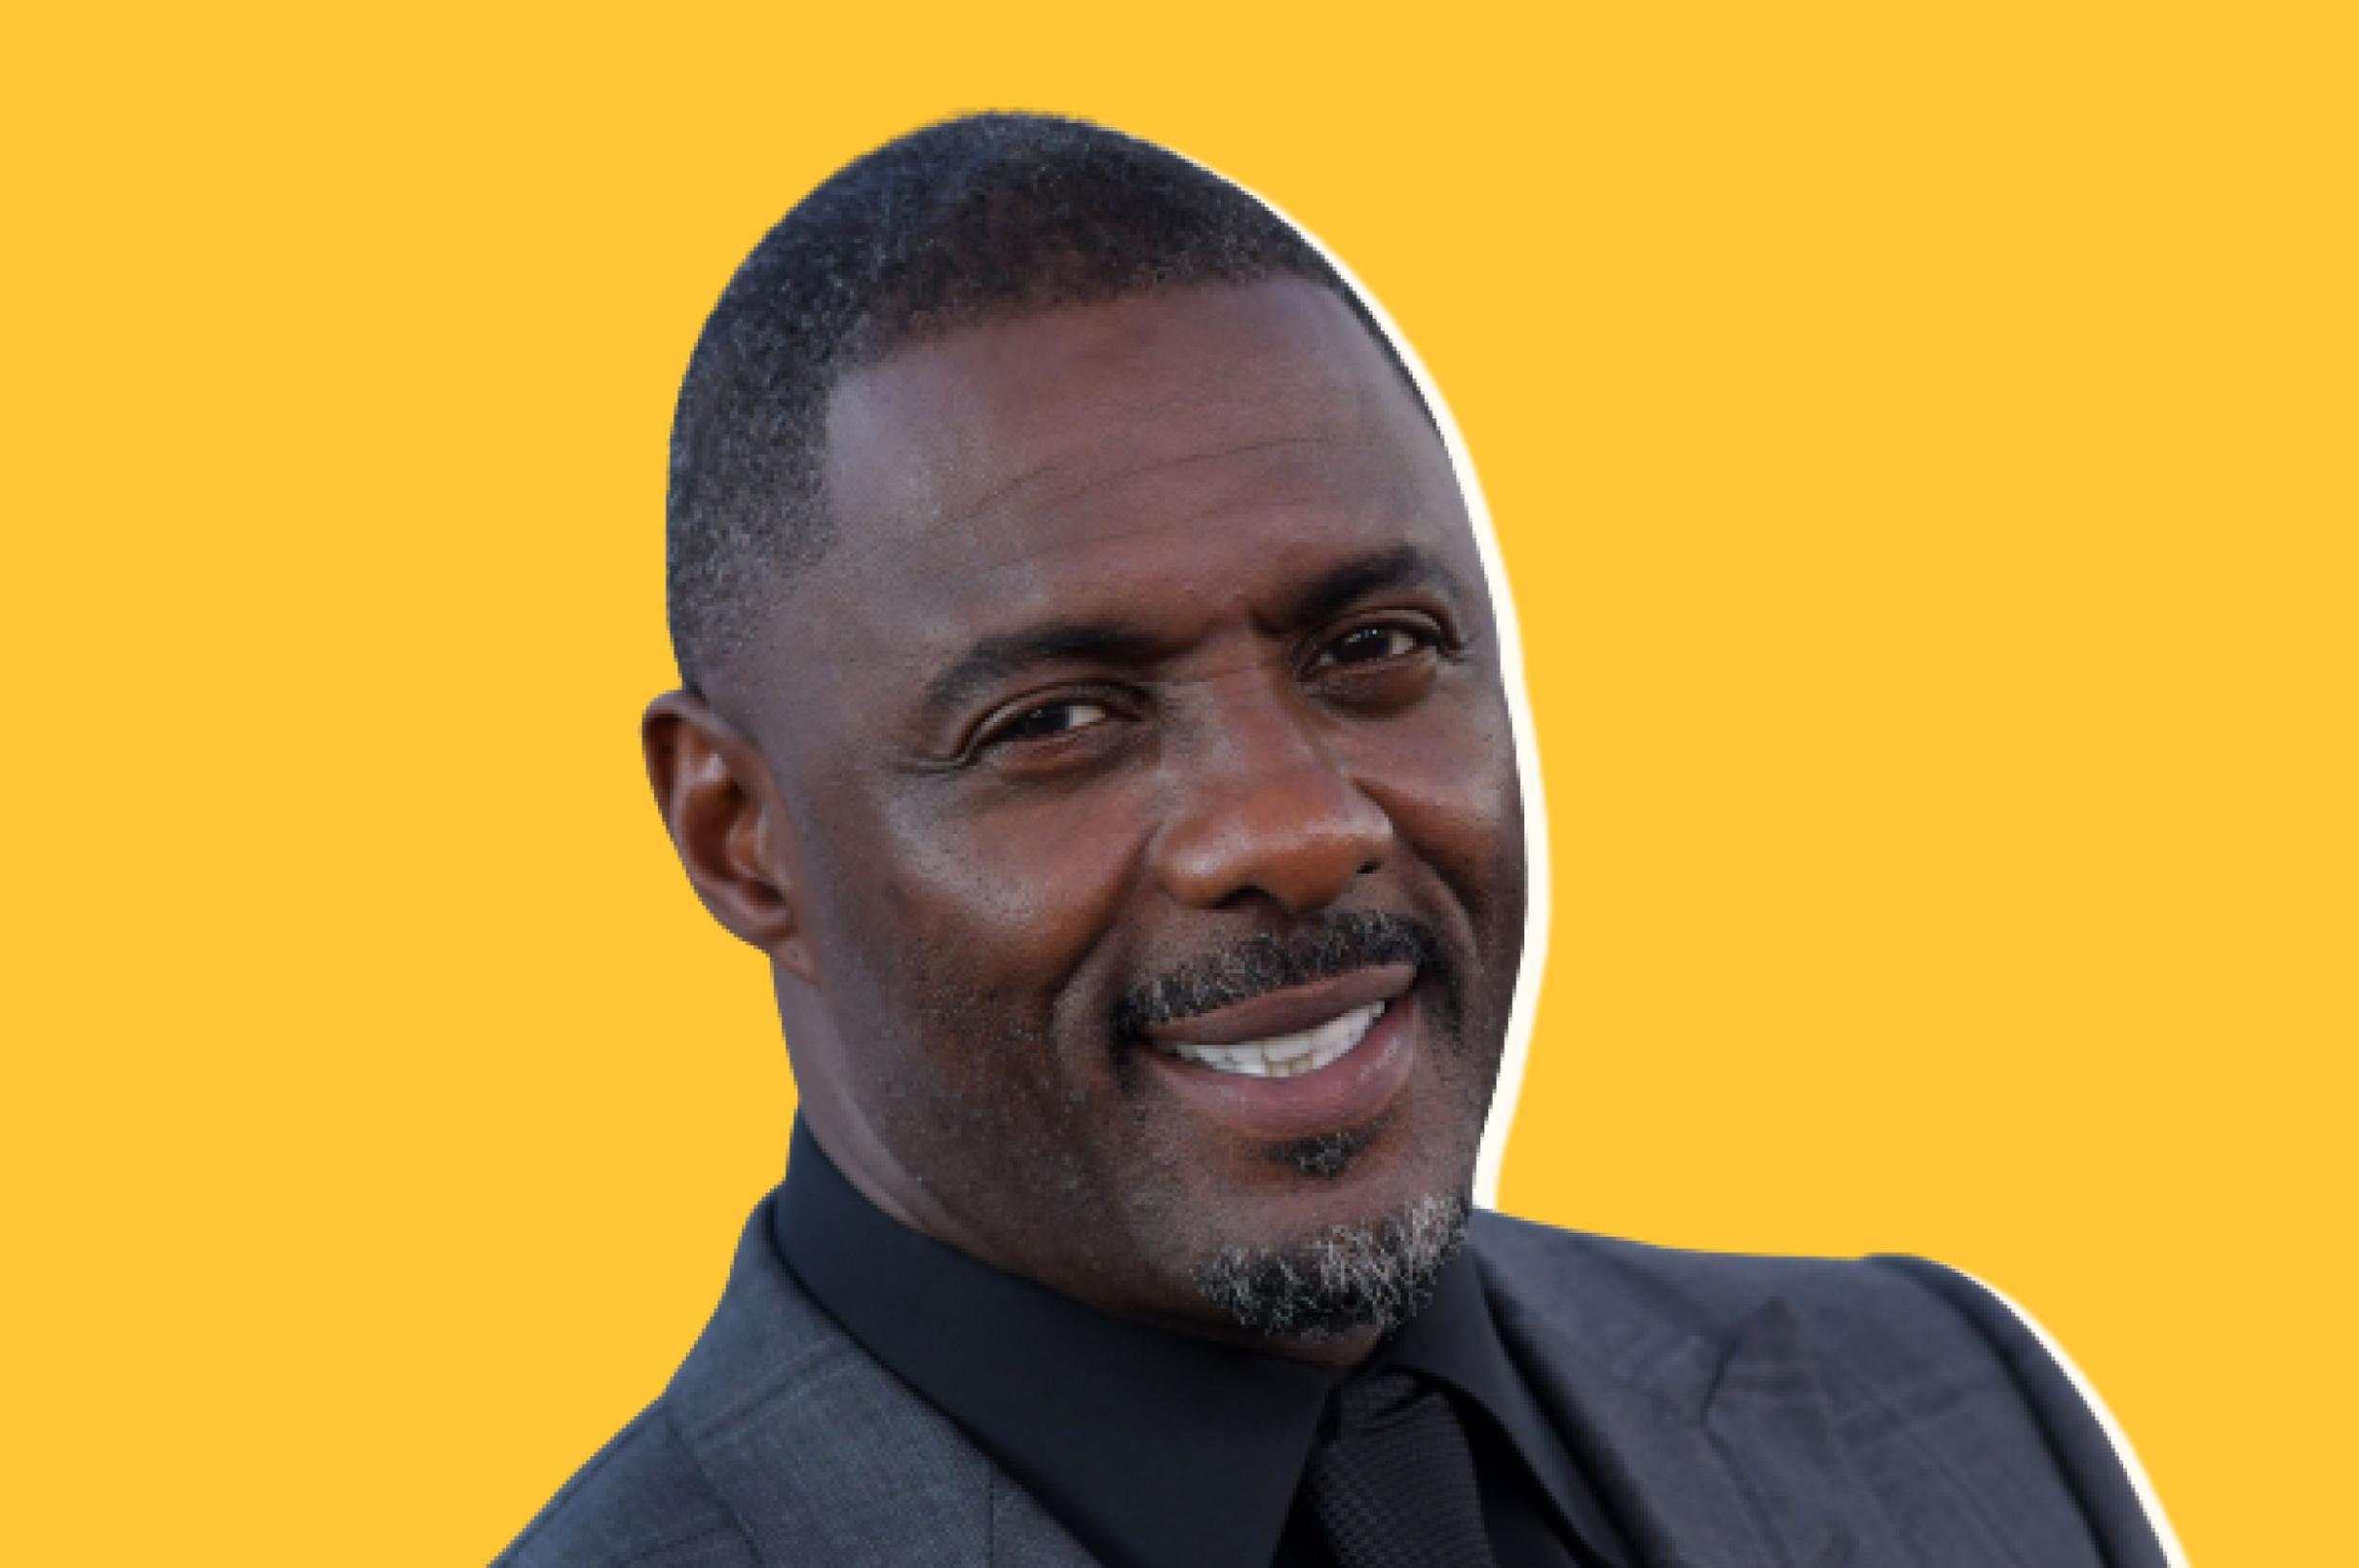 Idris Elba condemns attacks on Gaza